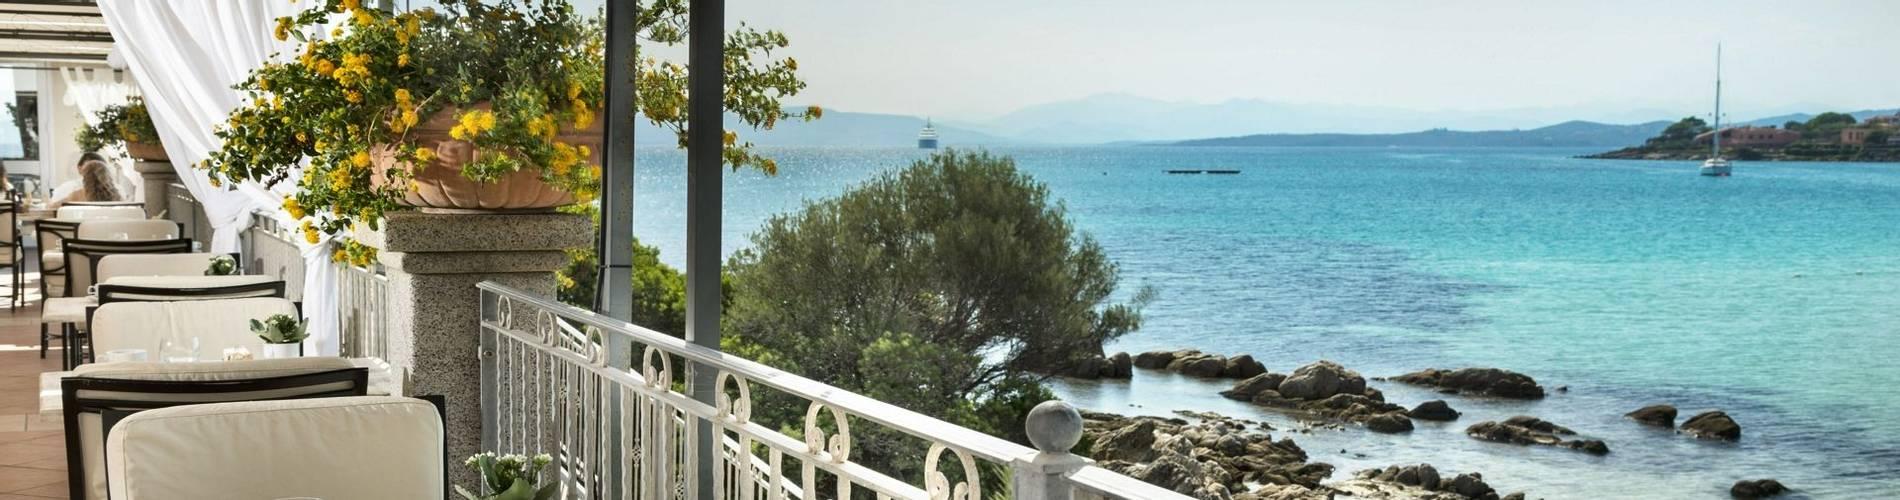 Breakfast on the terrace - Gabbiano azzurro Hotel _ Suites - stampa6.jpg